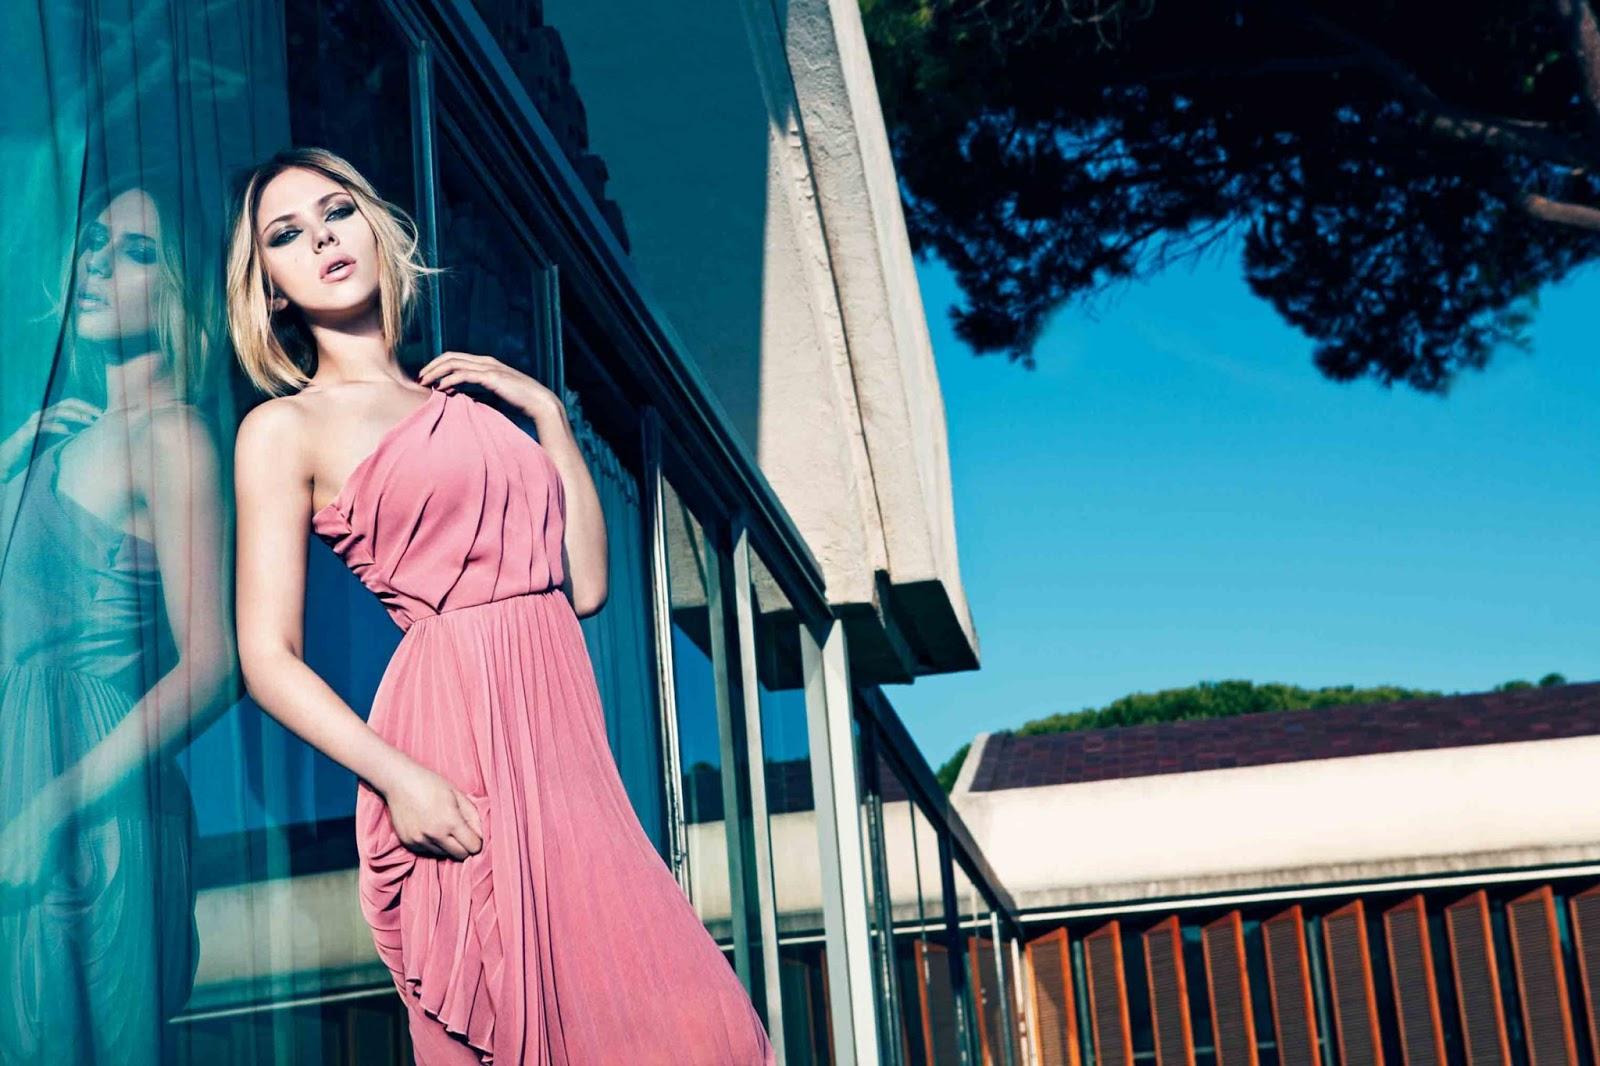 HQ Pics of Scarlett Johansson